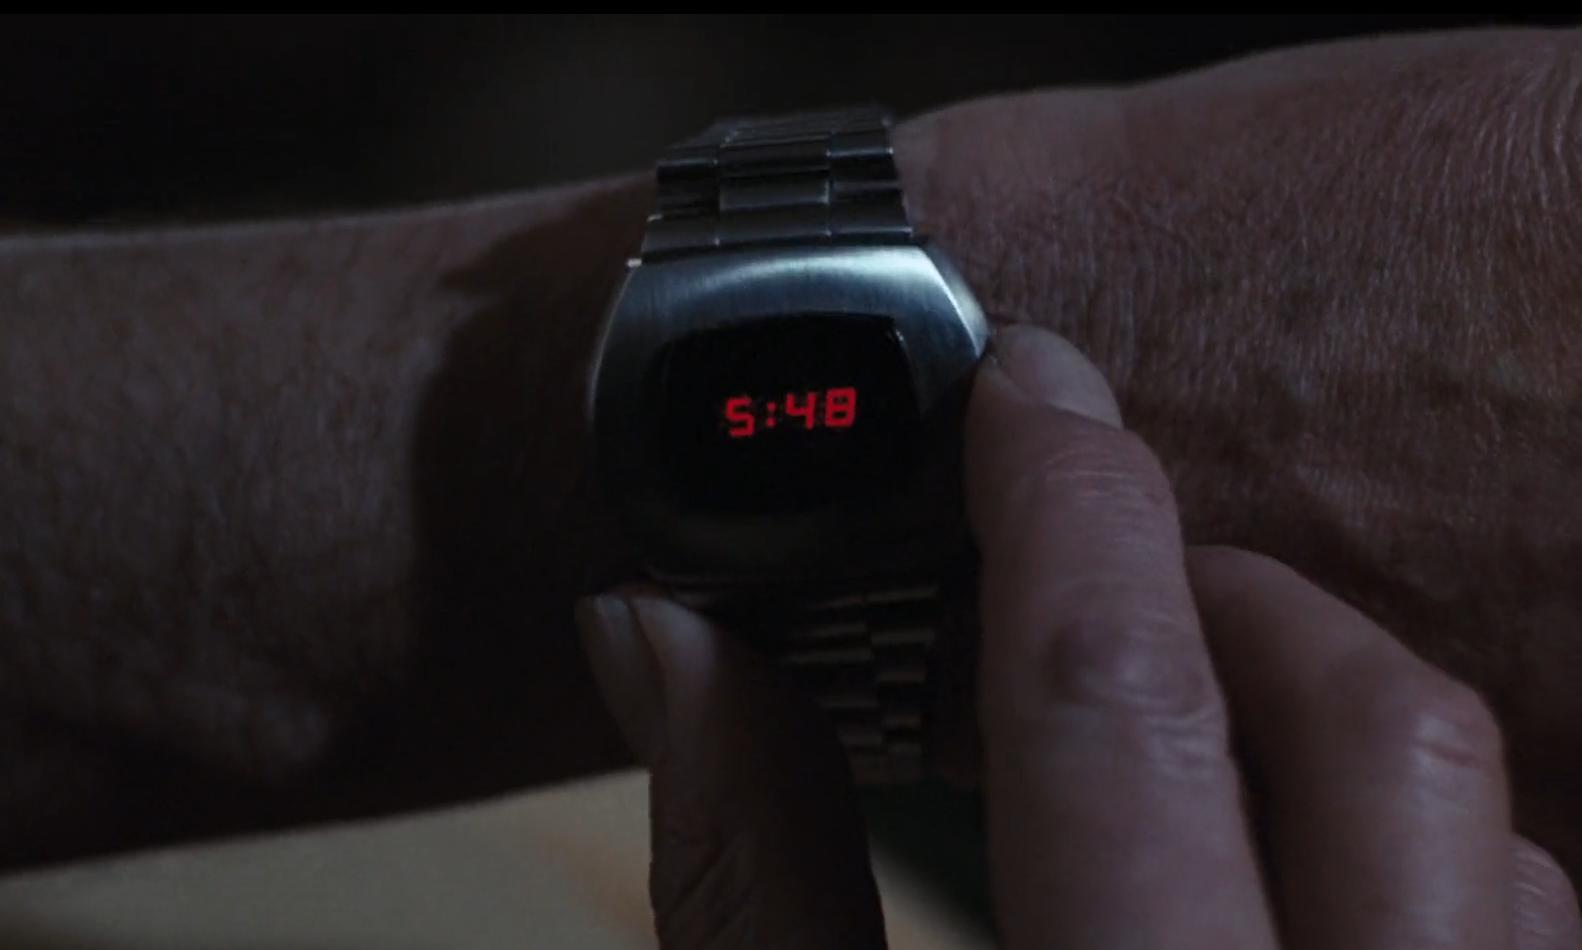 The Hamilton Pulsar P2 digital LED watch.